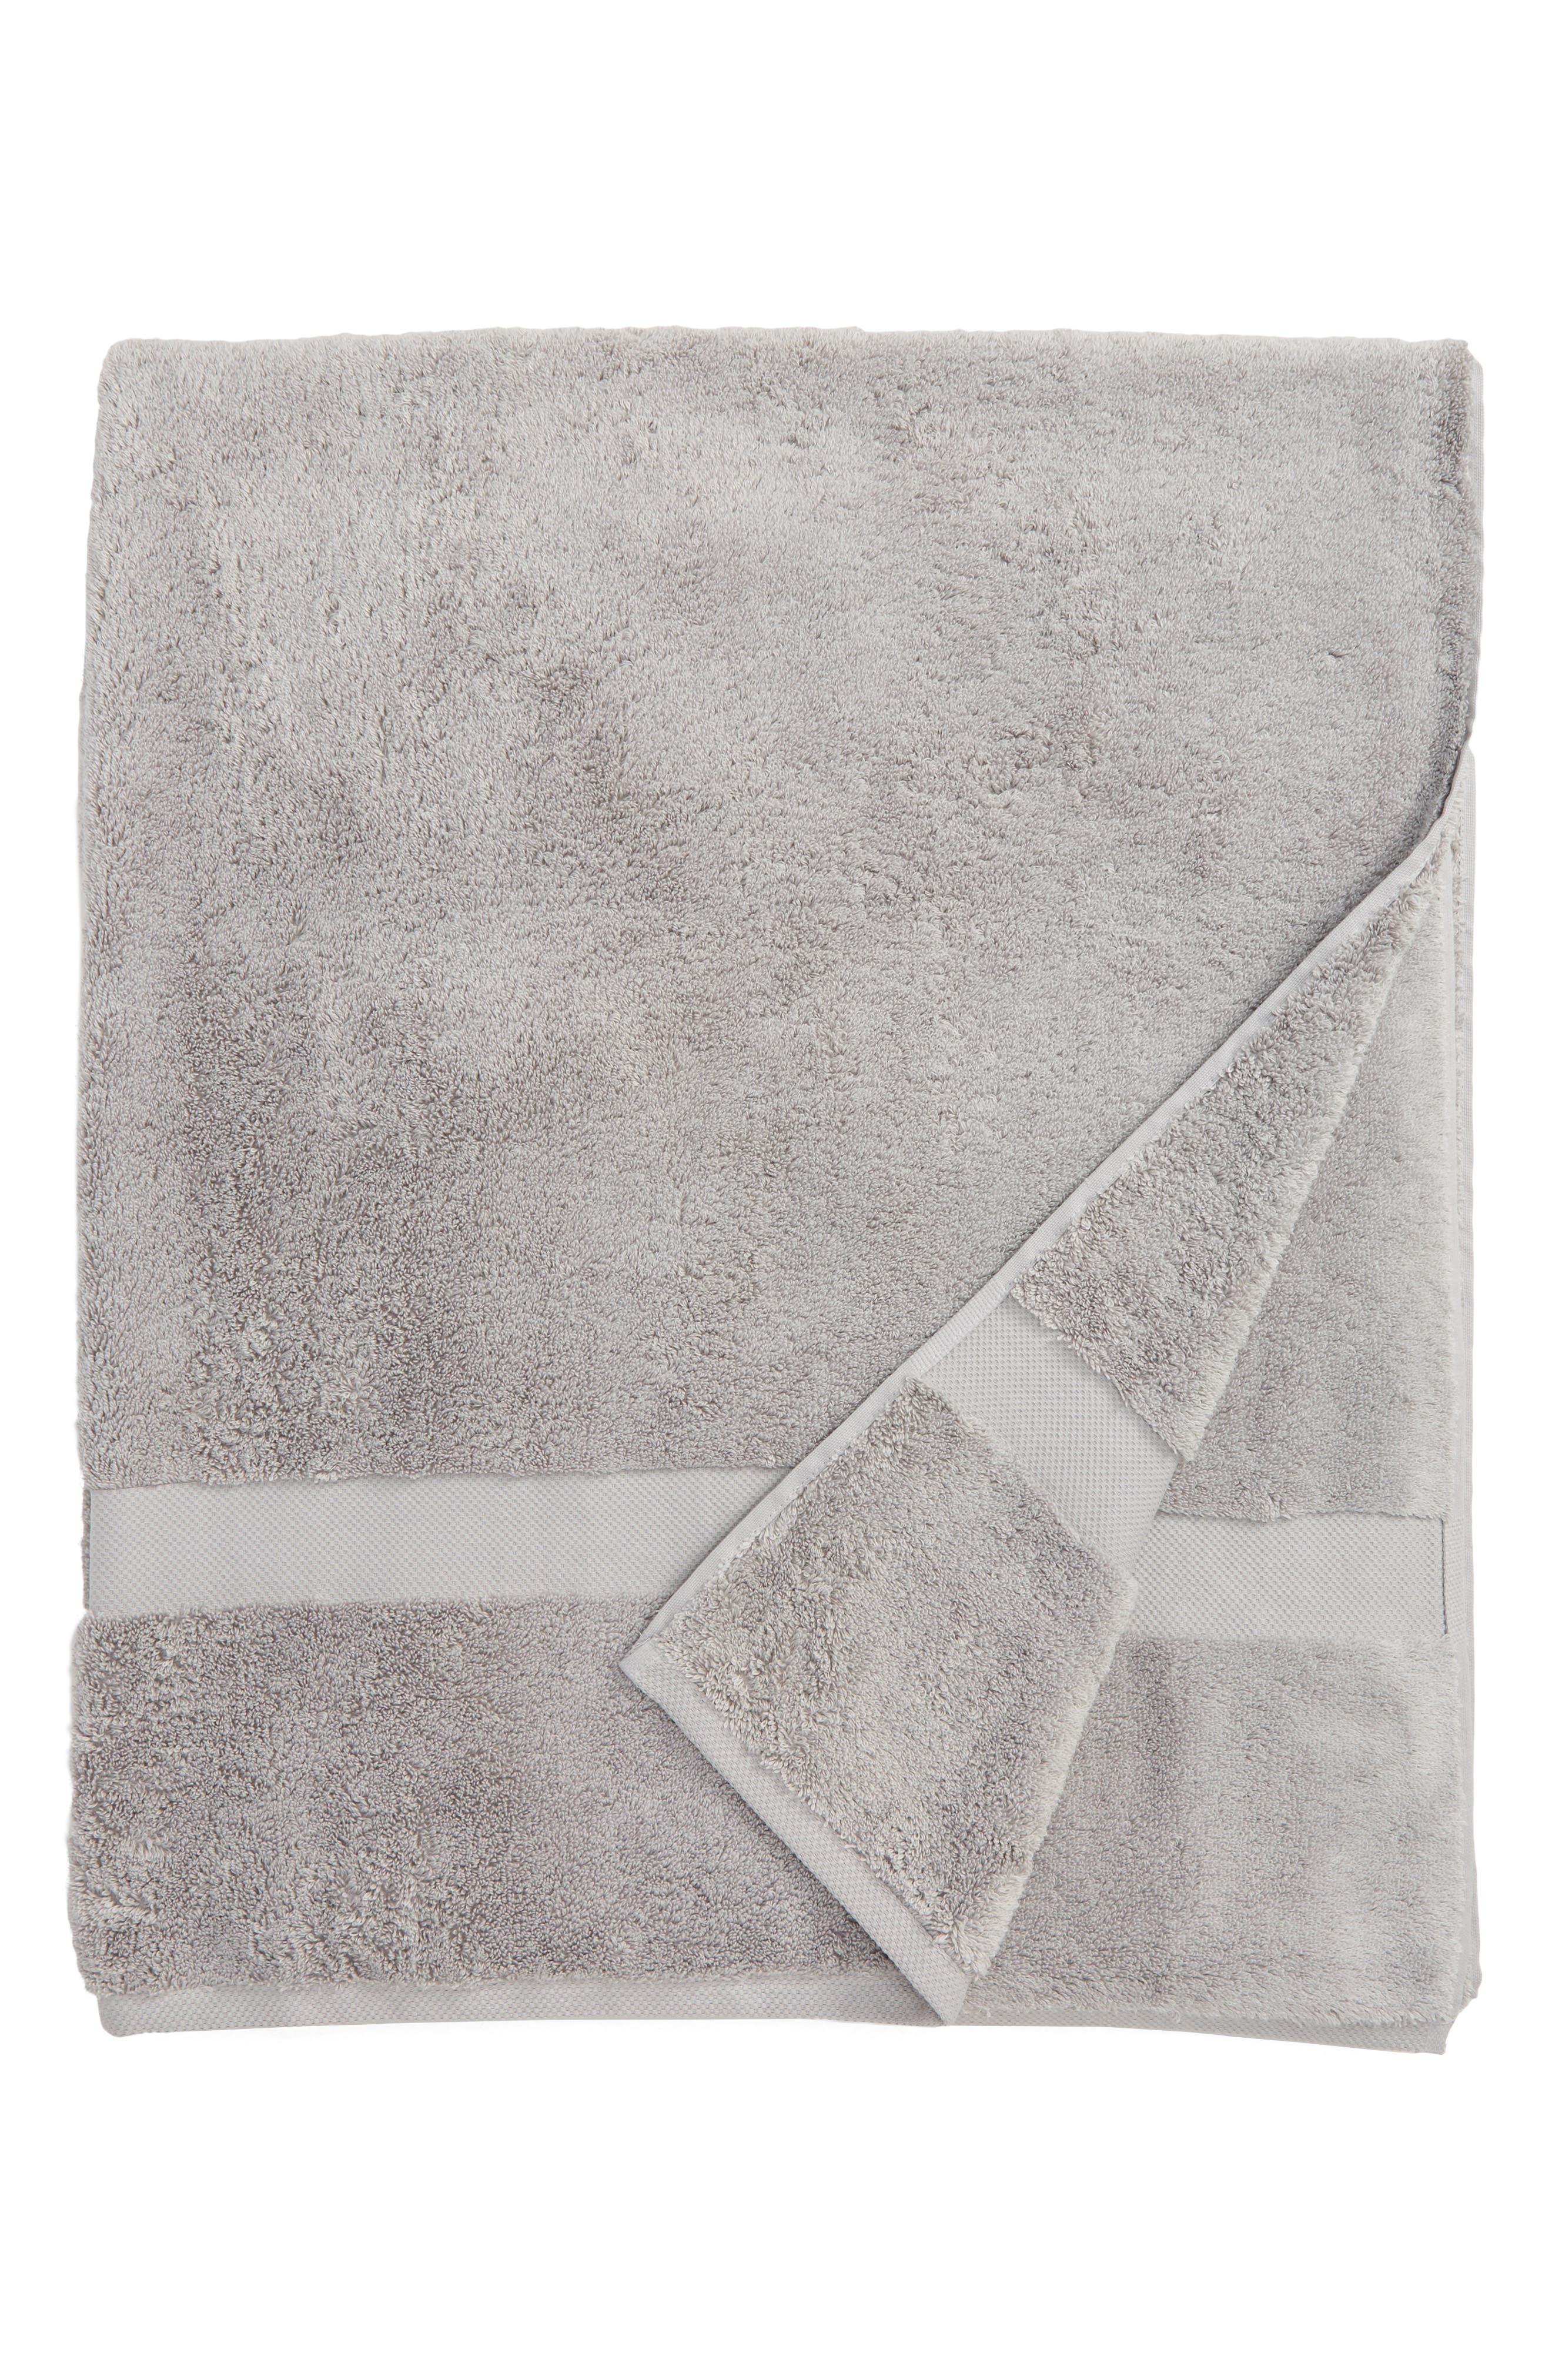 Lotus Bath Sheet,                         Main,                         color, Smoke